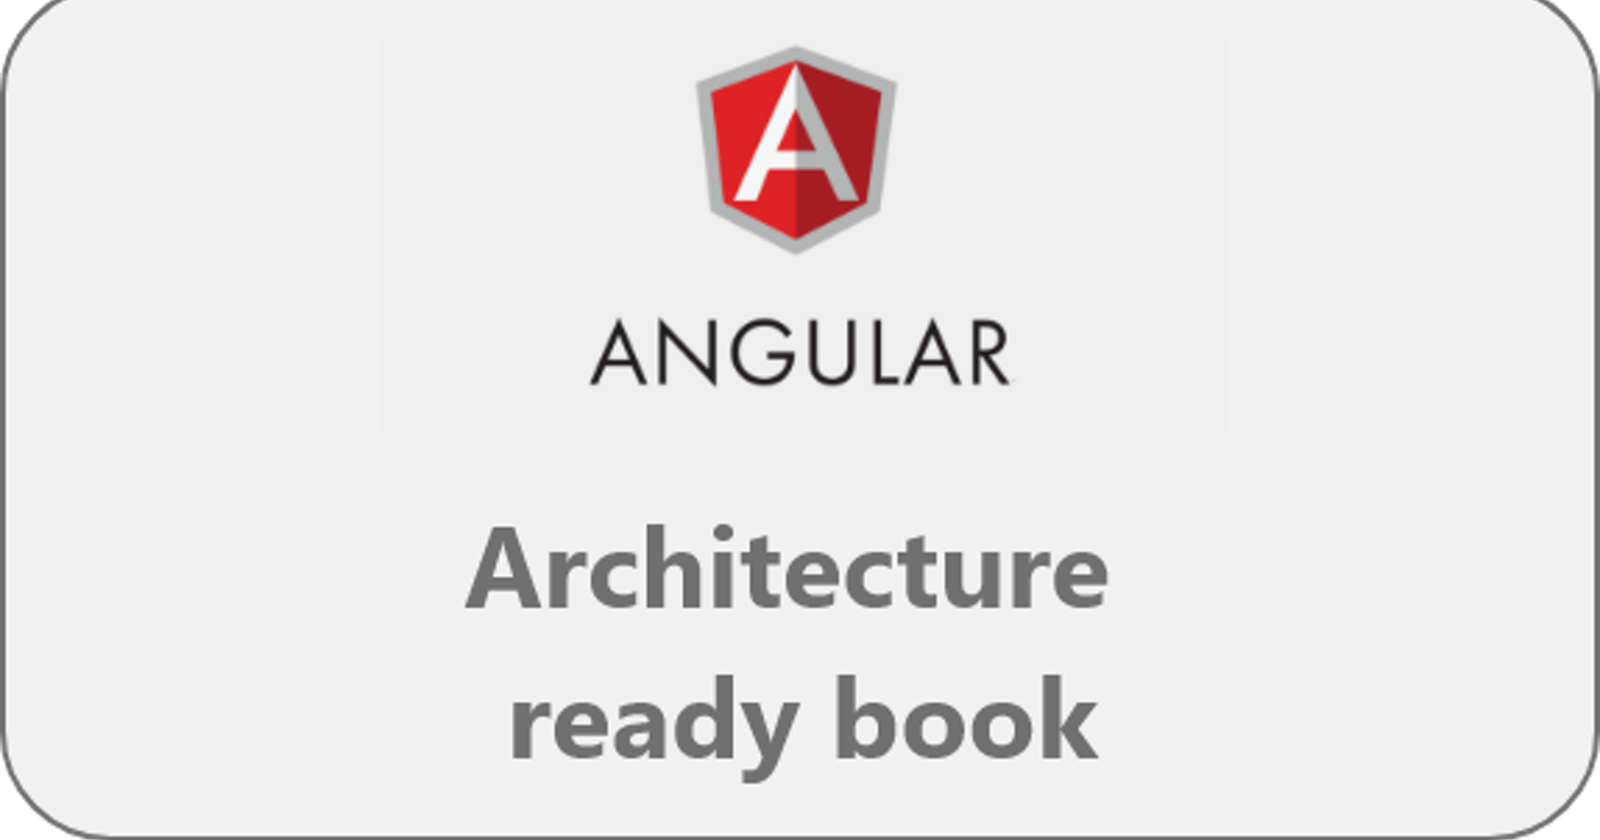 Angular architecture ready book